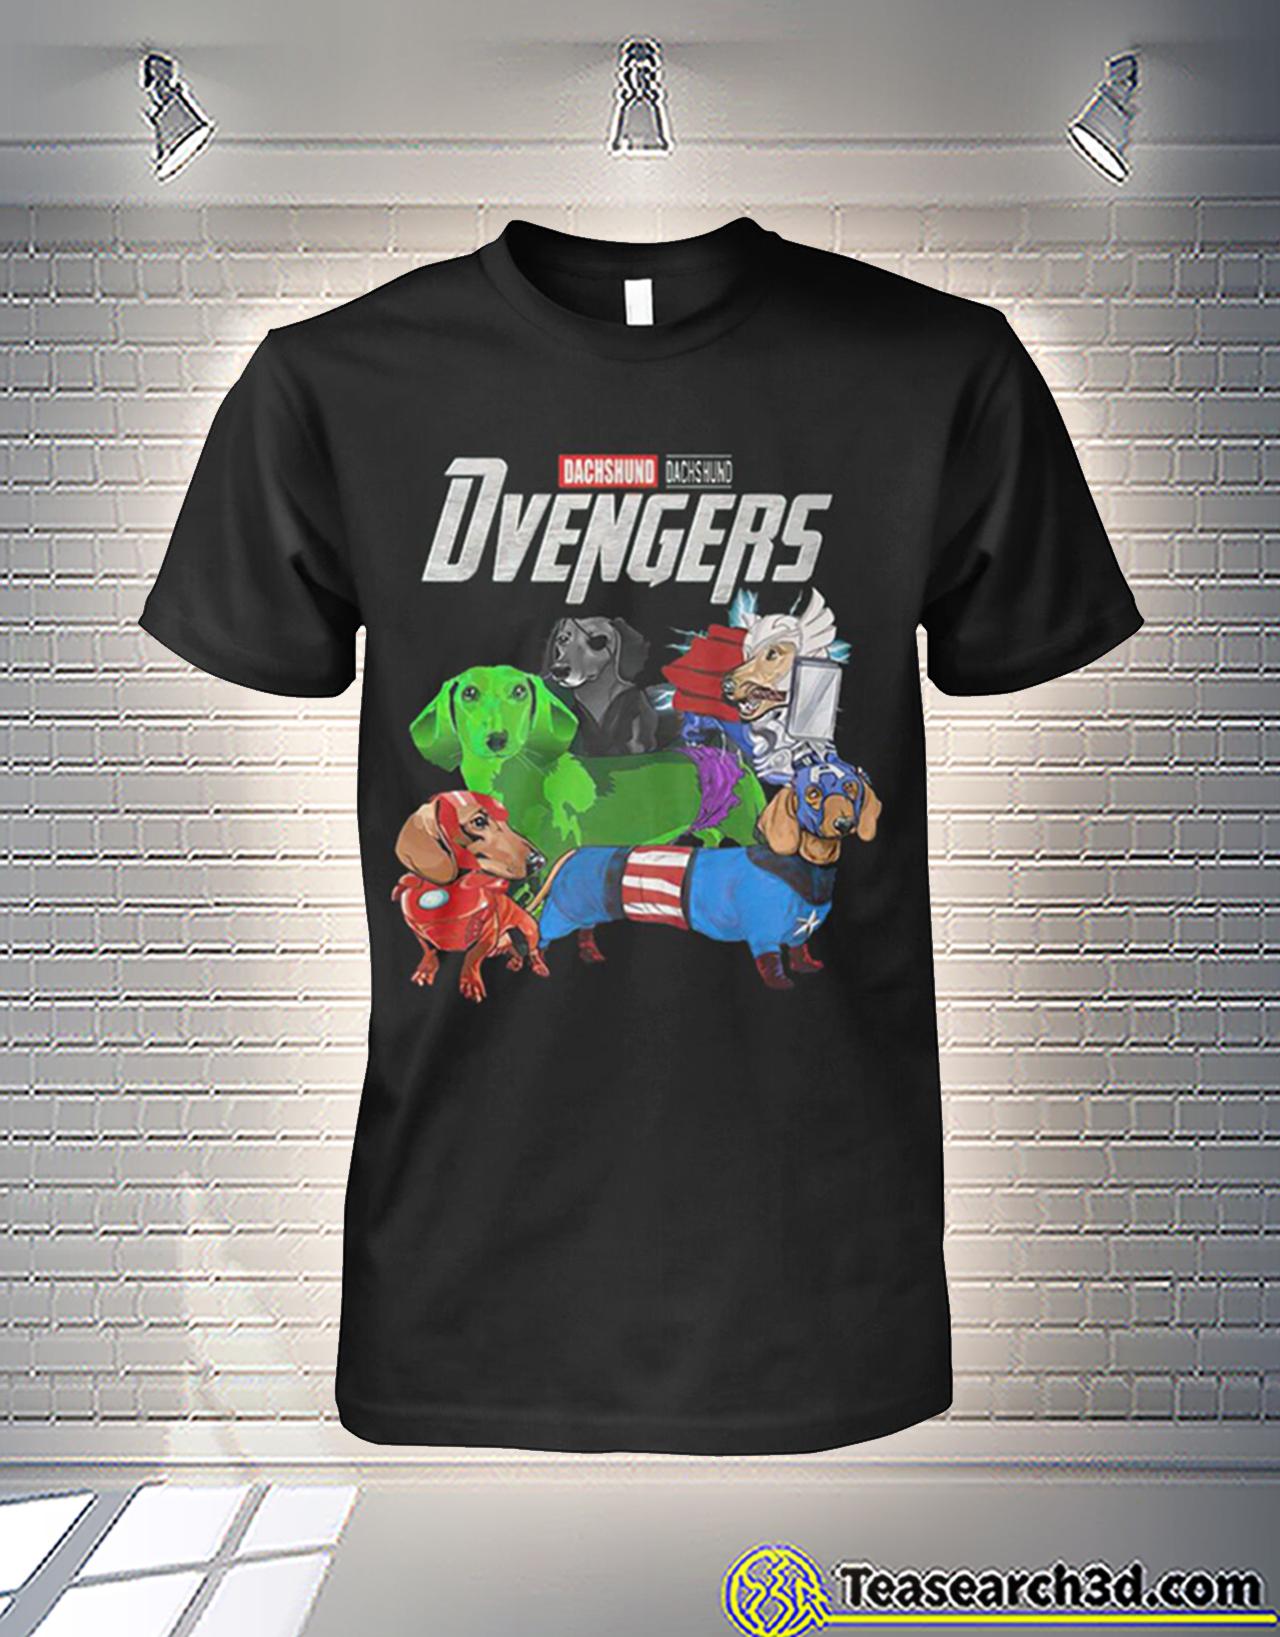 Dachshund dachshund dvengers avengers shirt